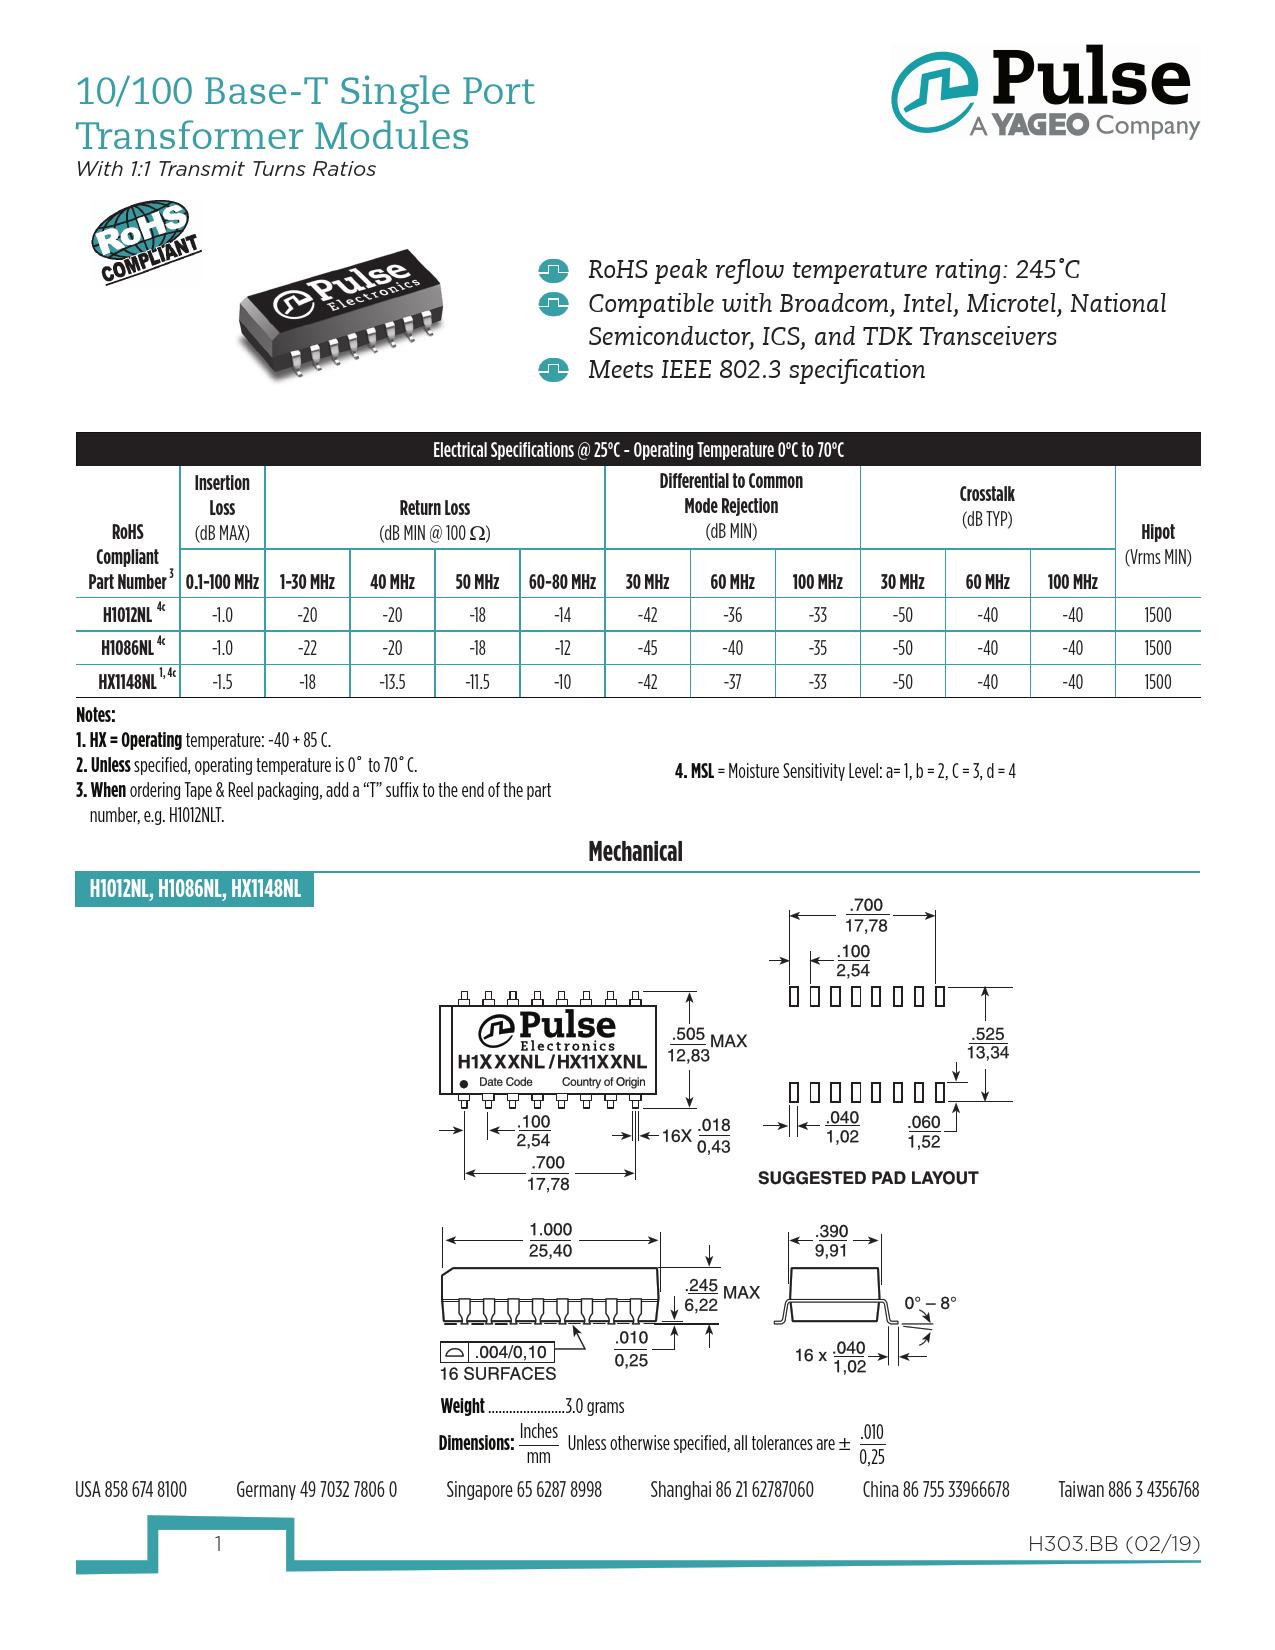 Datasheet H1012NL, H1086NL, HX1148NL Pulse Electronics